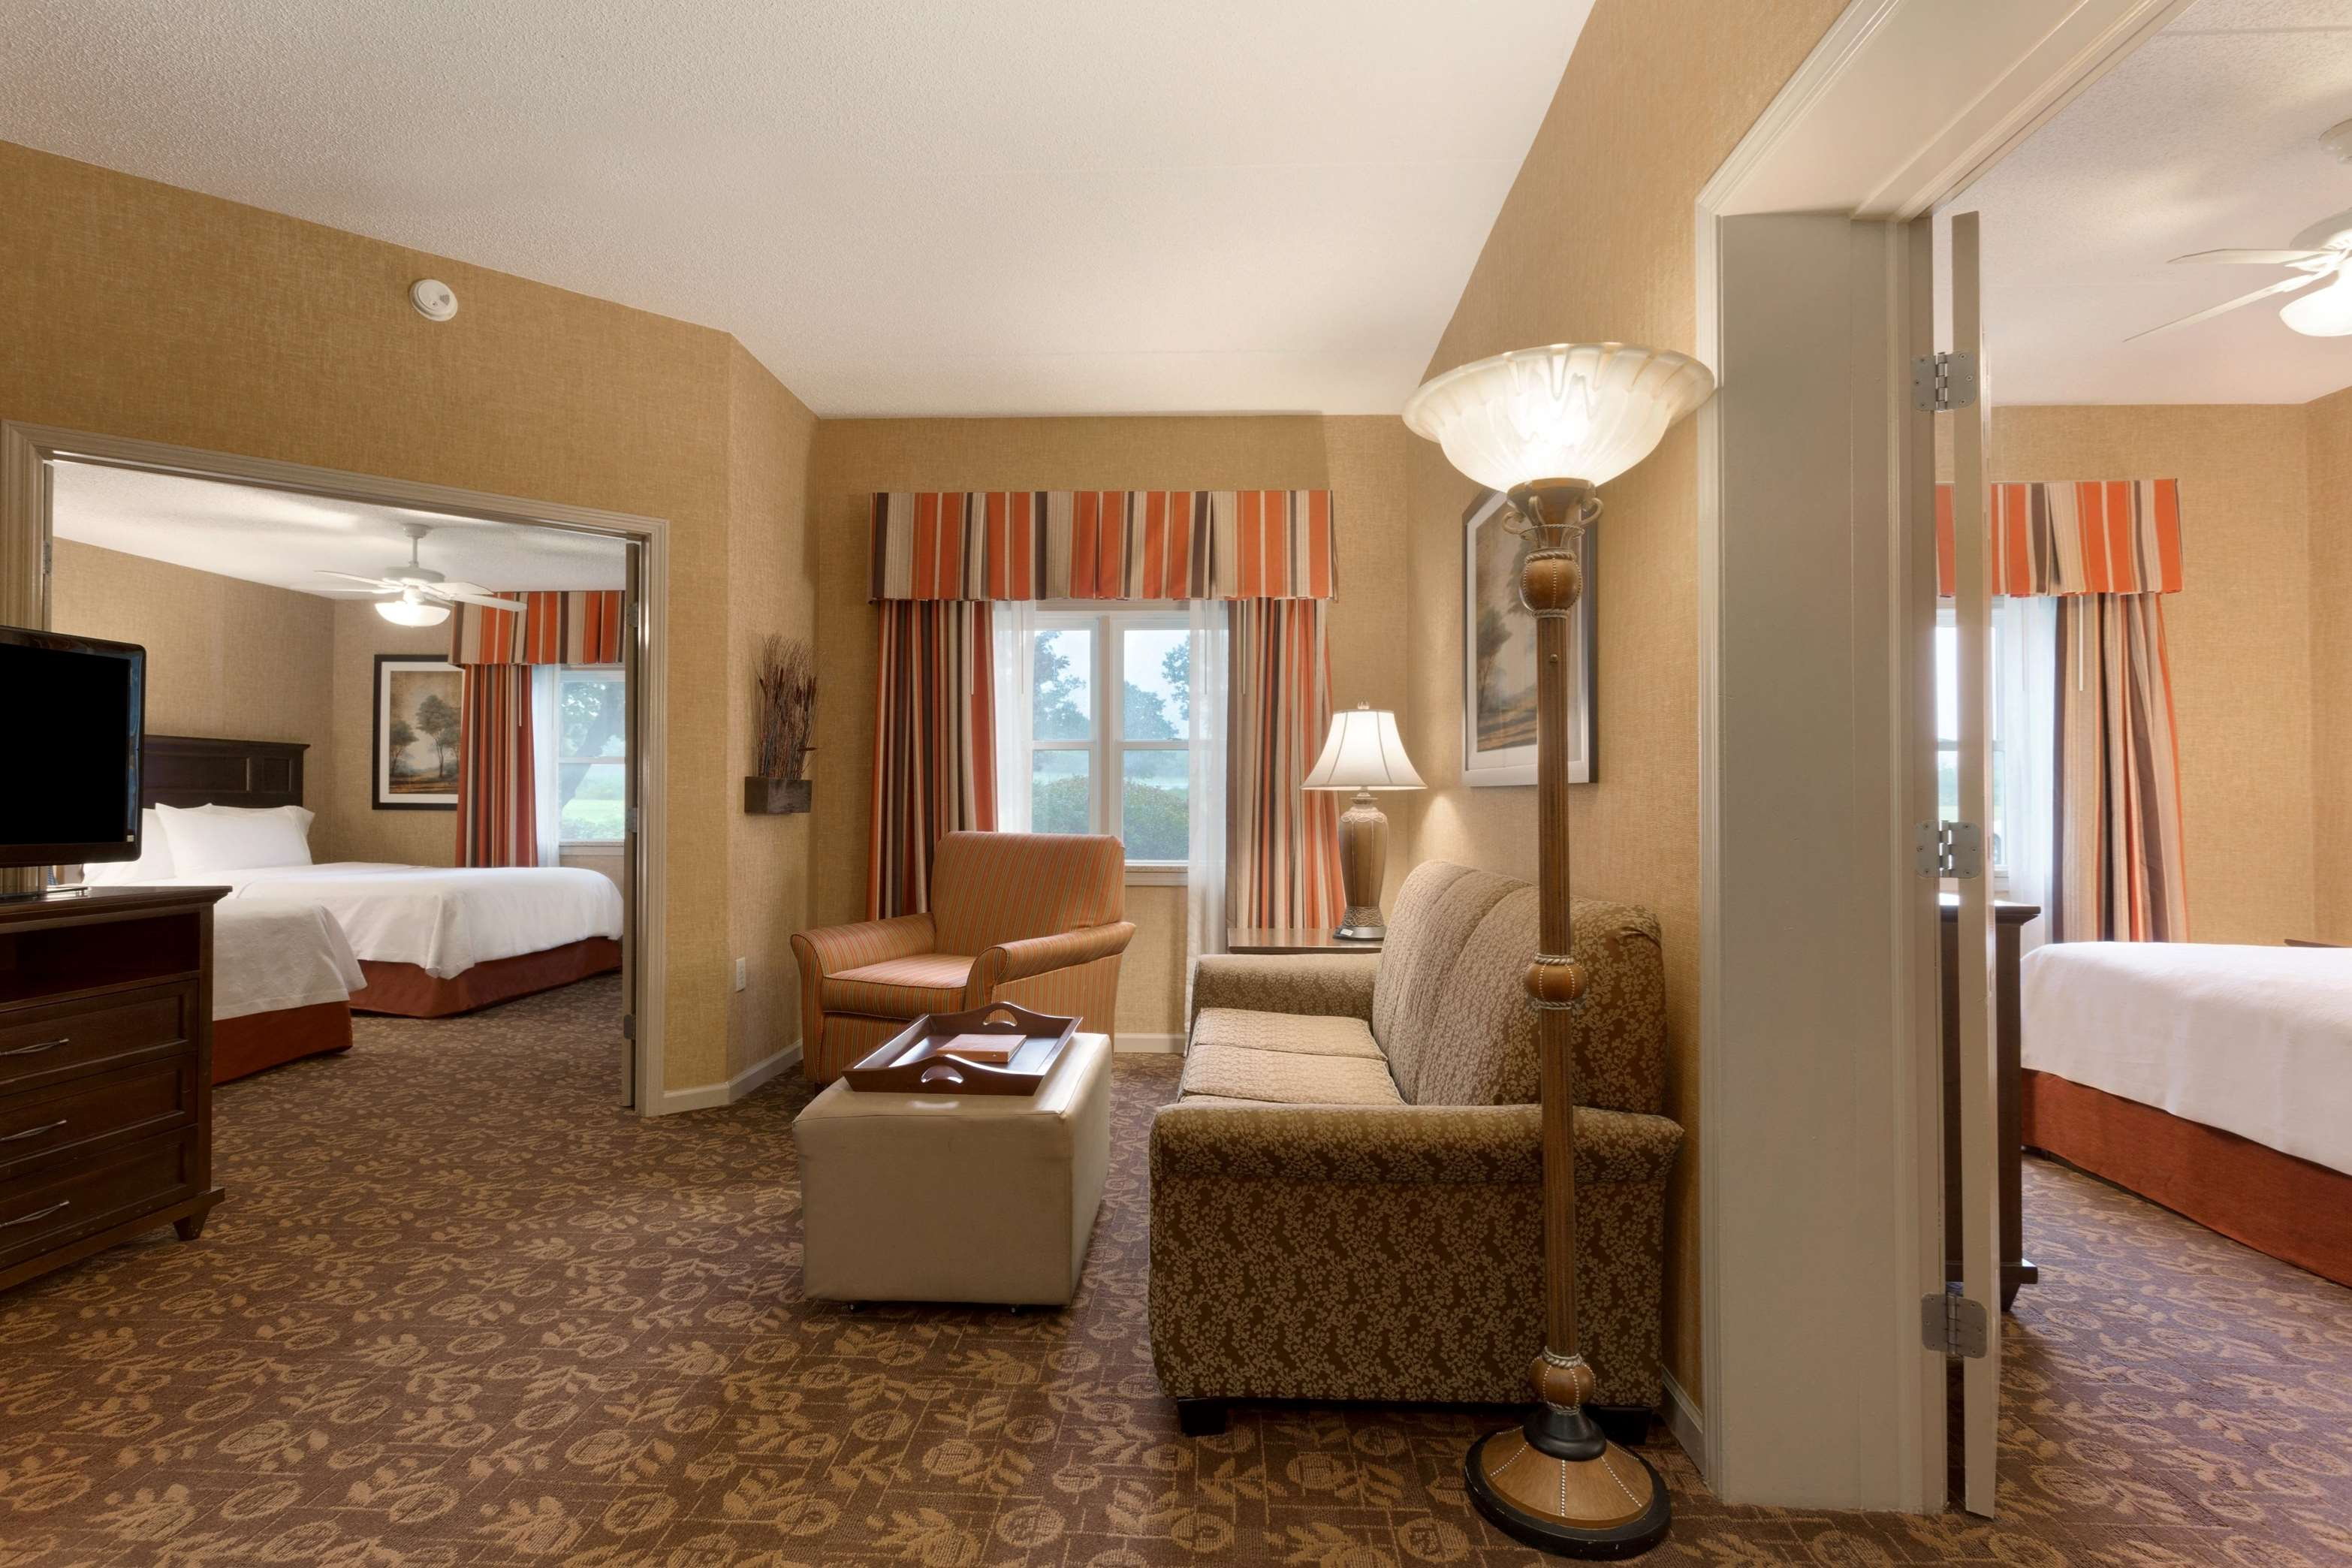 Homewood Suites by Hilton Syracuse/Liverpool image 22